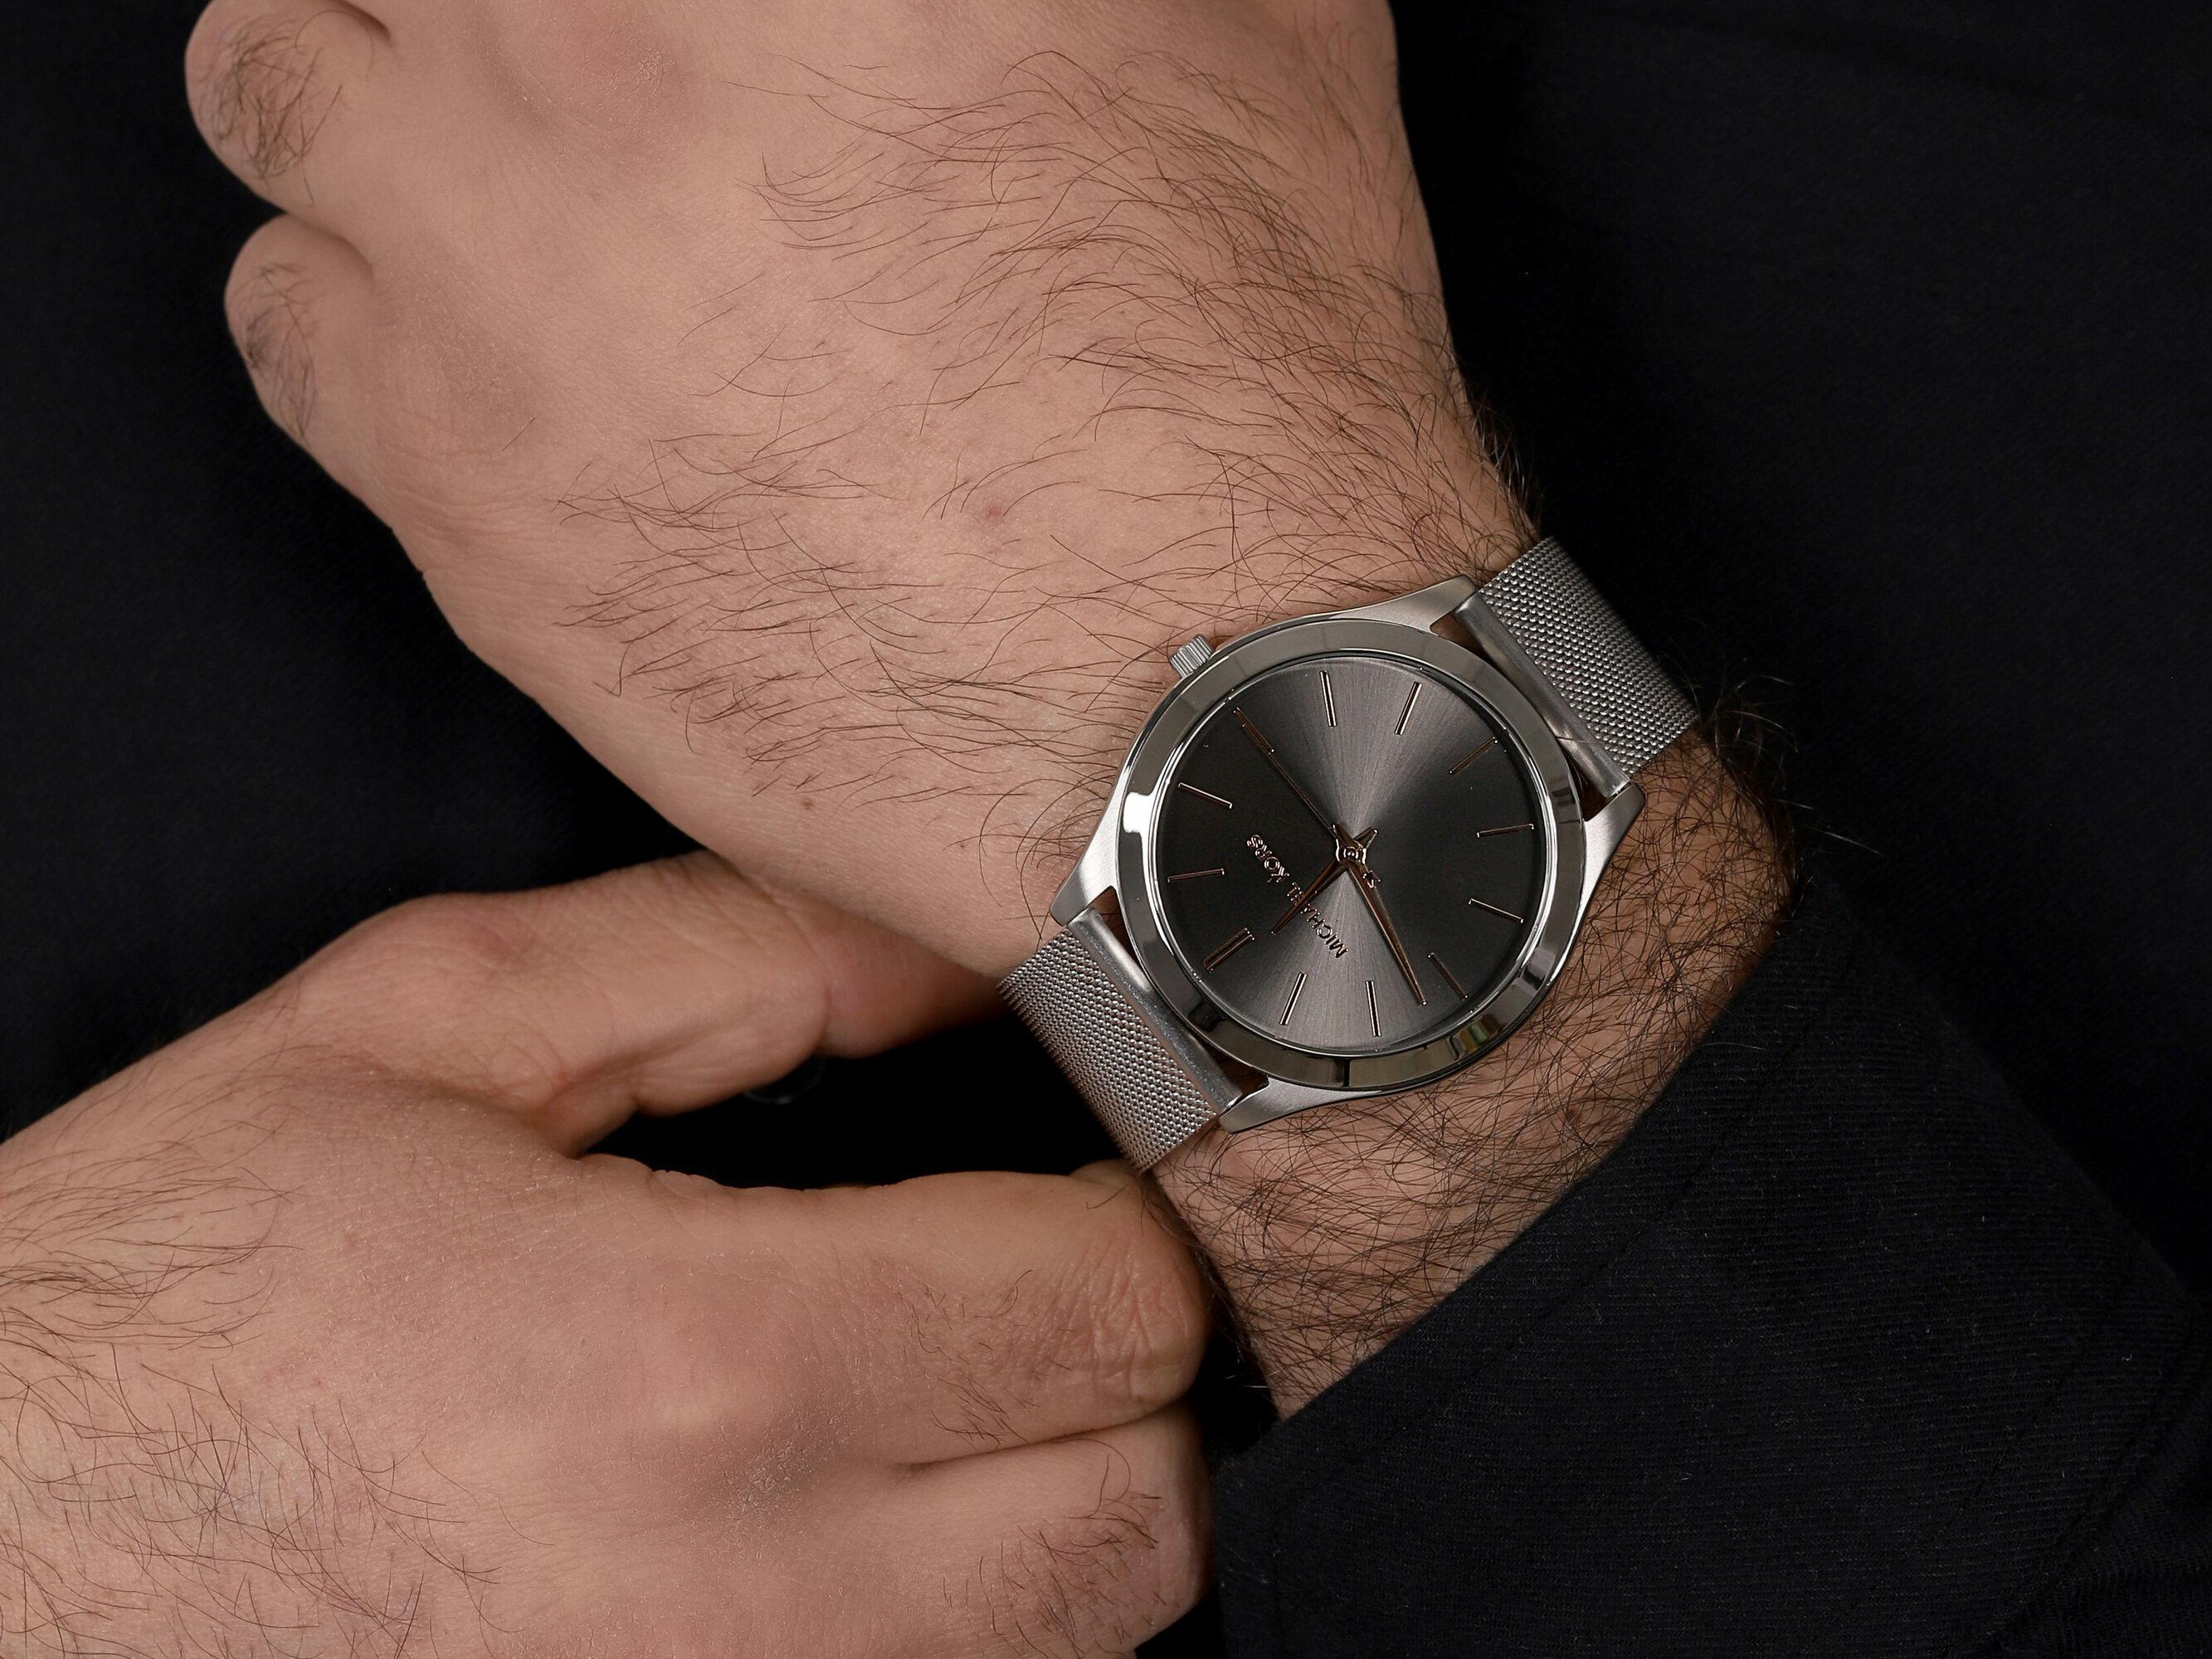 Michael Kors MK8656 męski zegarek Runway bransoleta